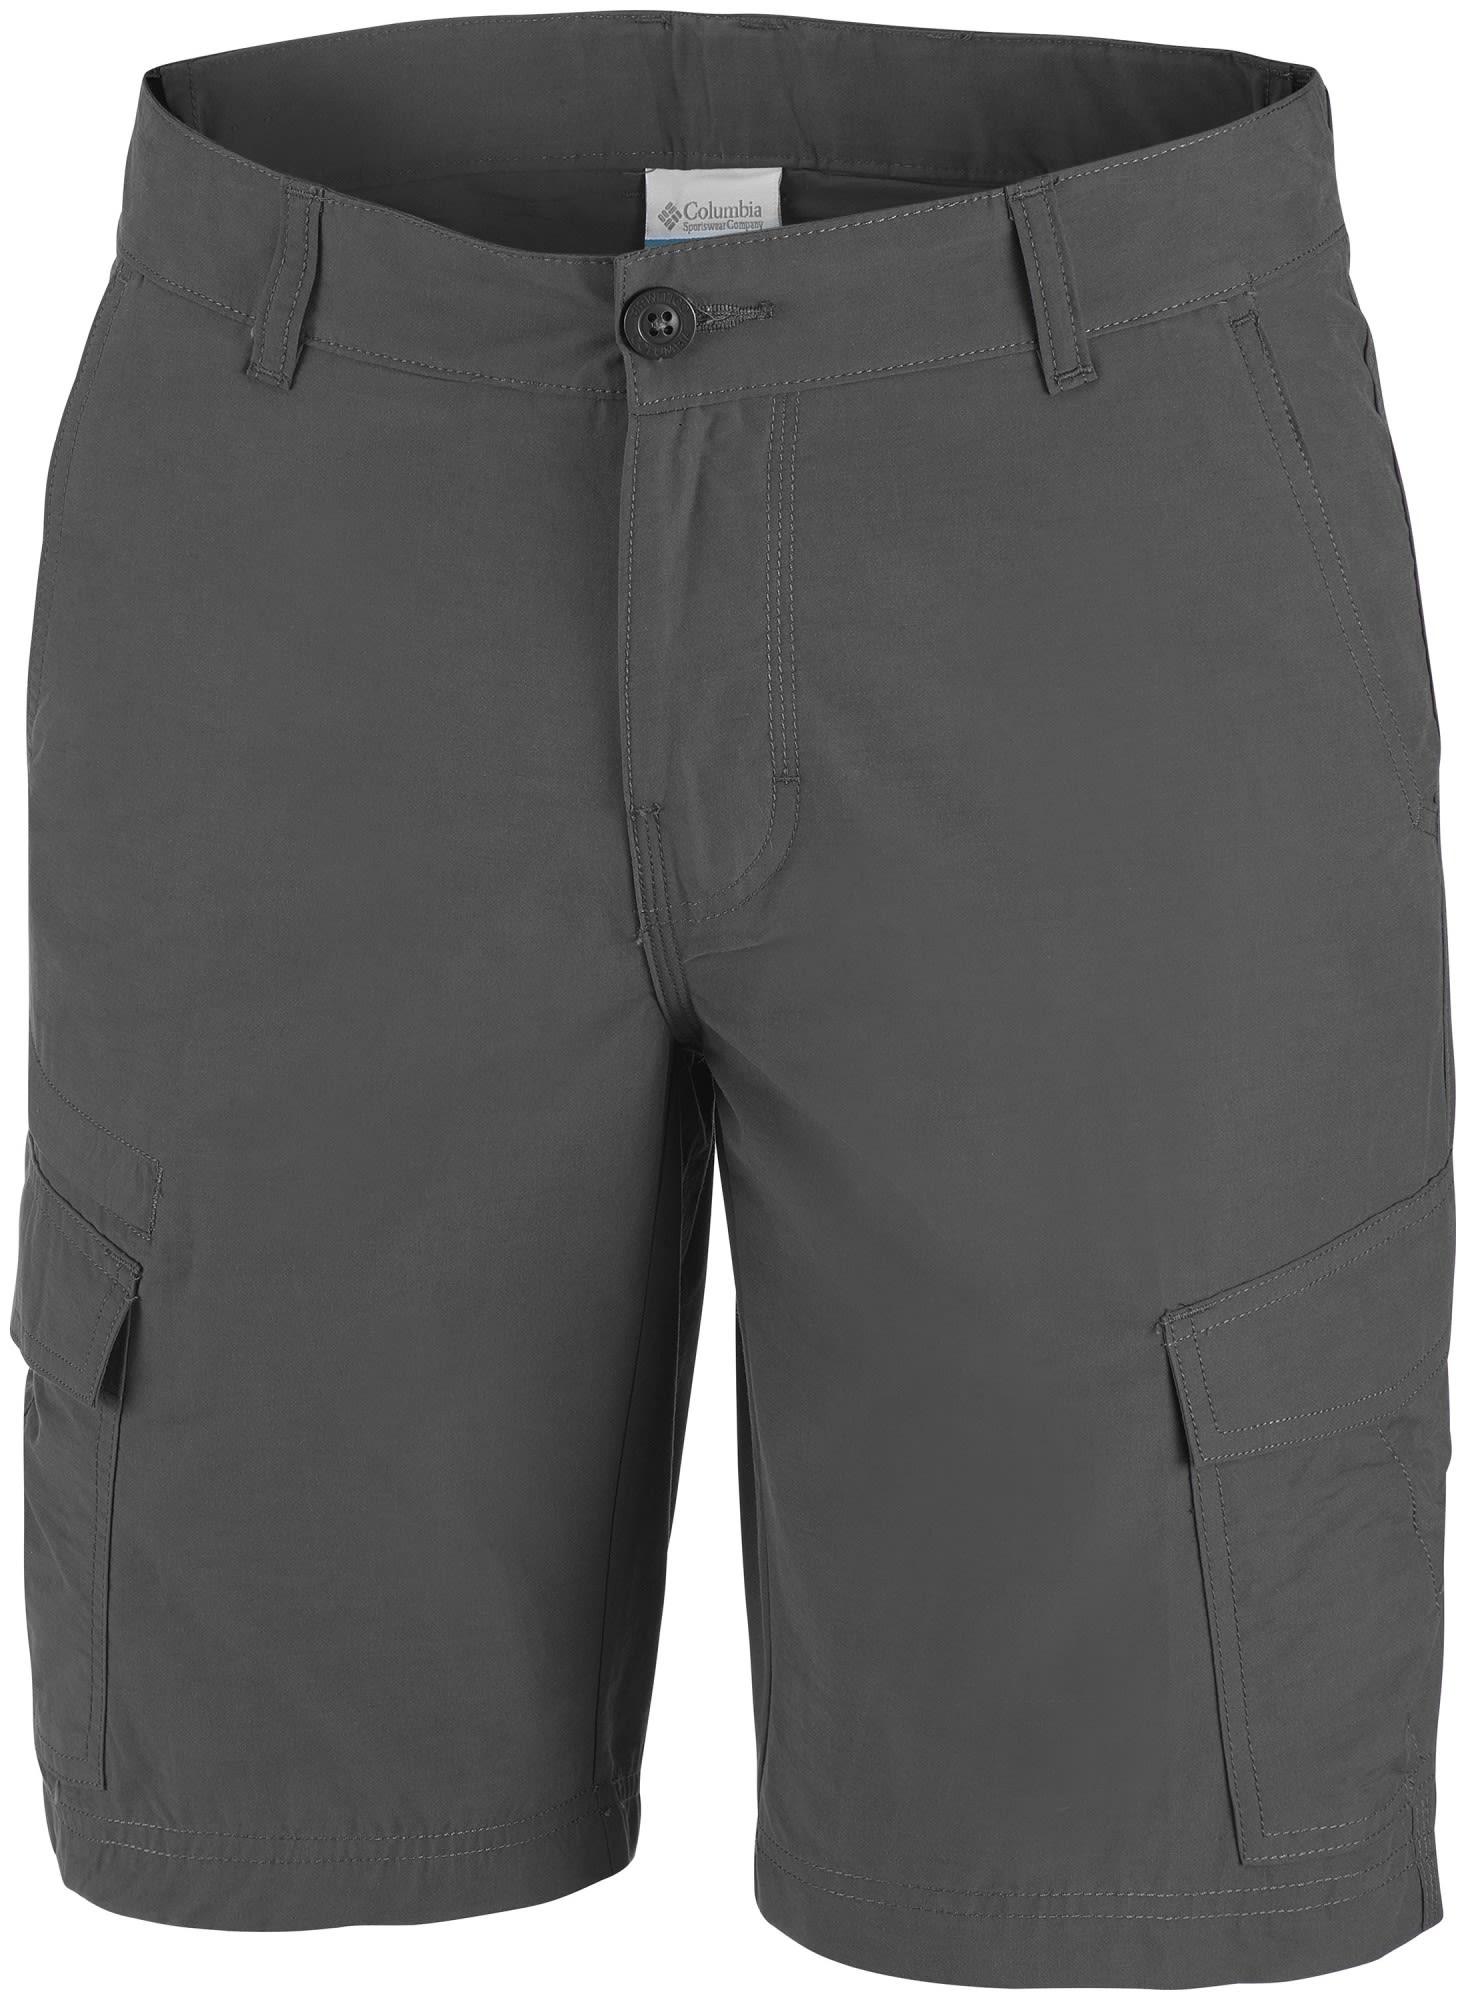 Columbia Paro Valley IV Short Grau, Male Shorts, 34